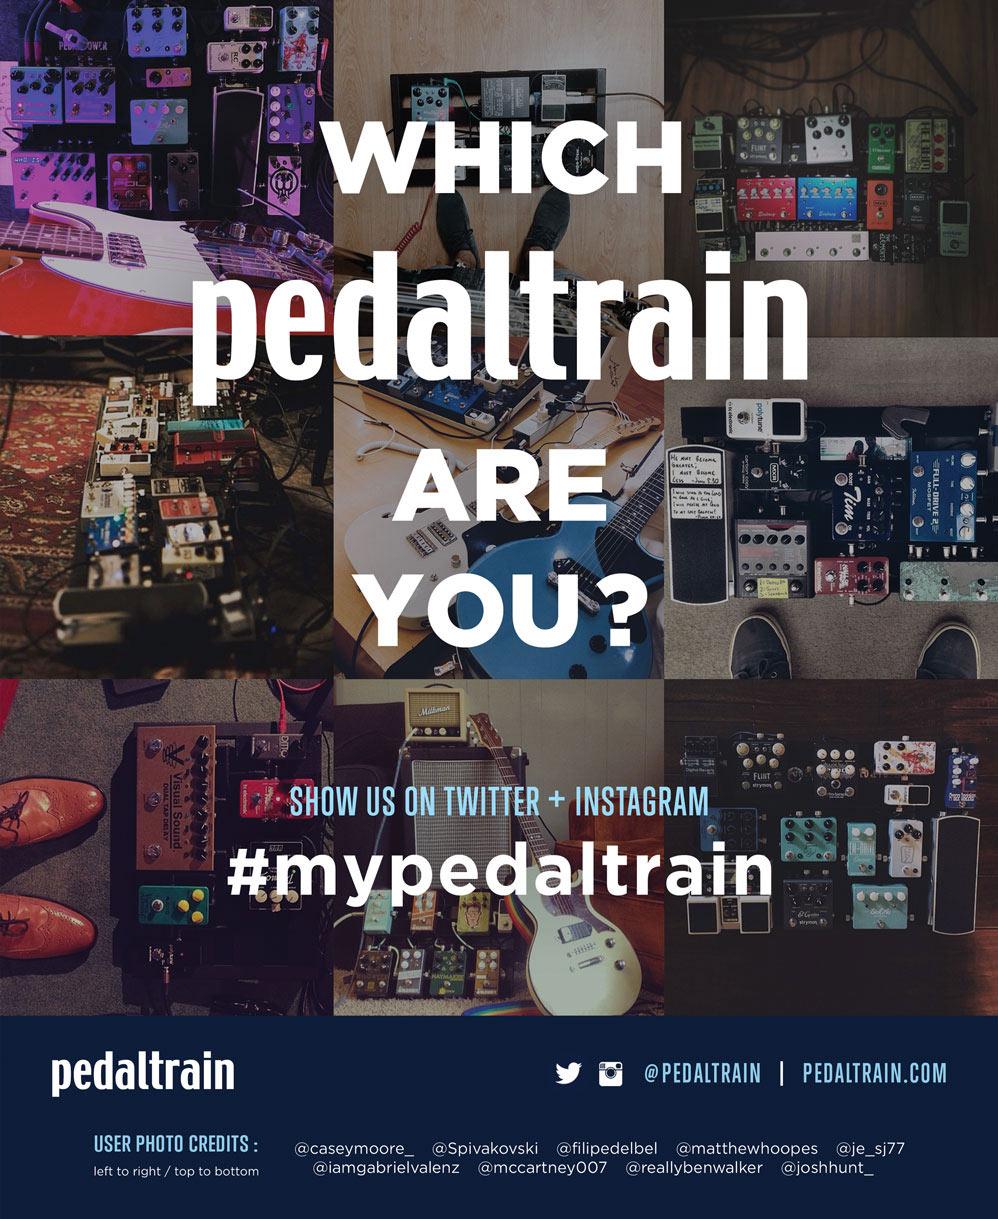 #mypedaltrain